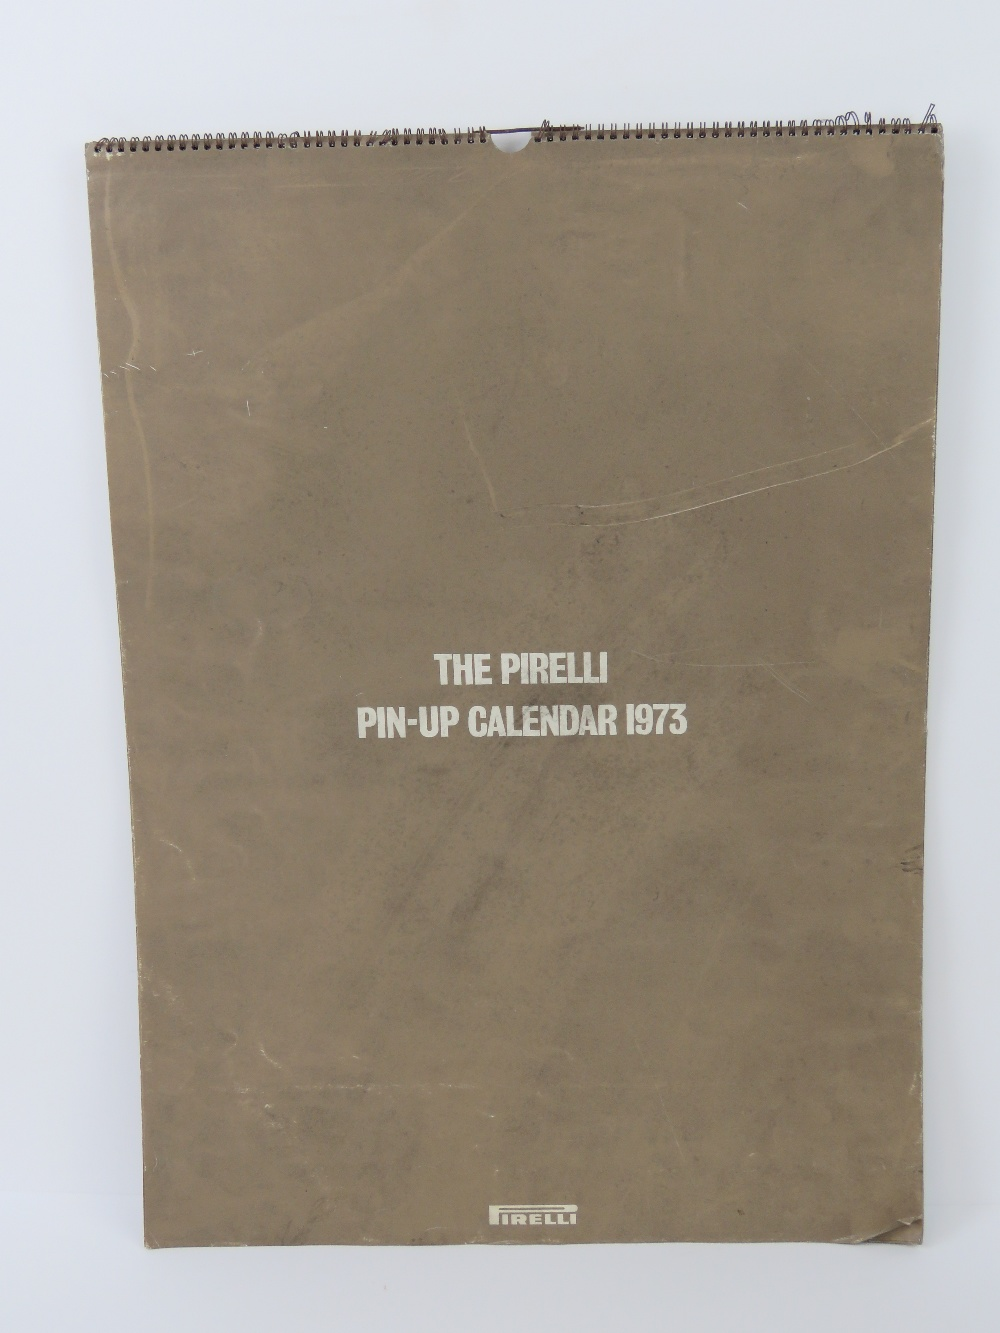 Lot 30 - A rare copy of the Pirelli Pin-Up calend